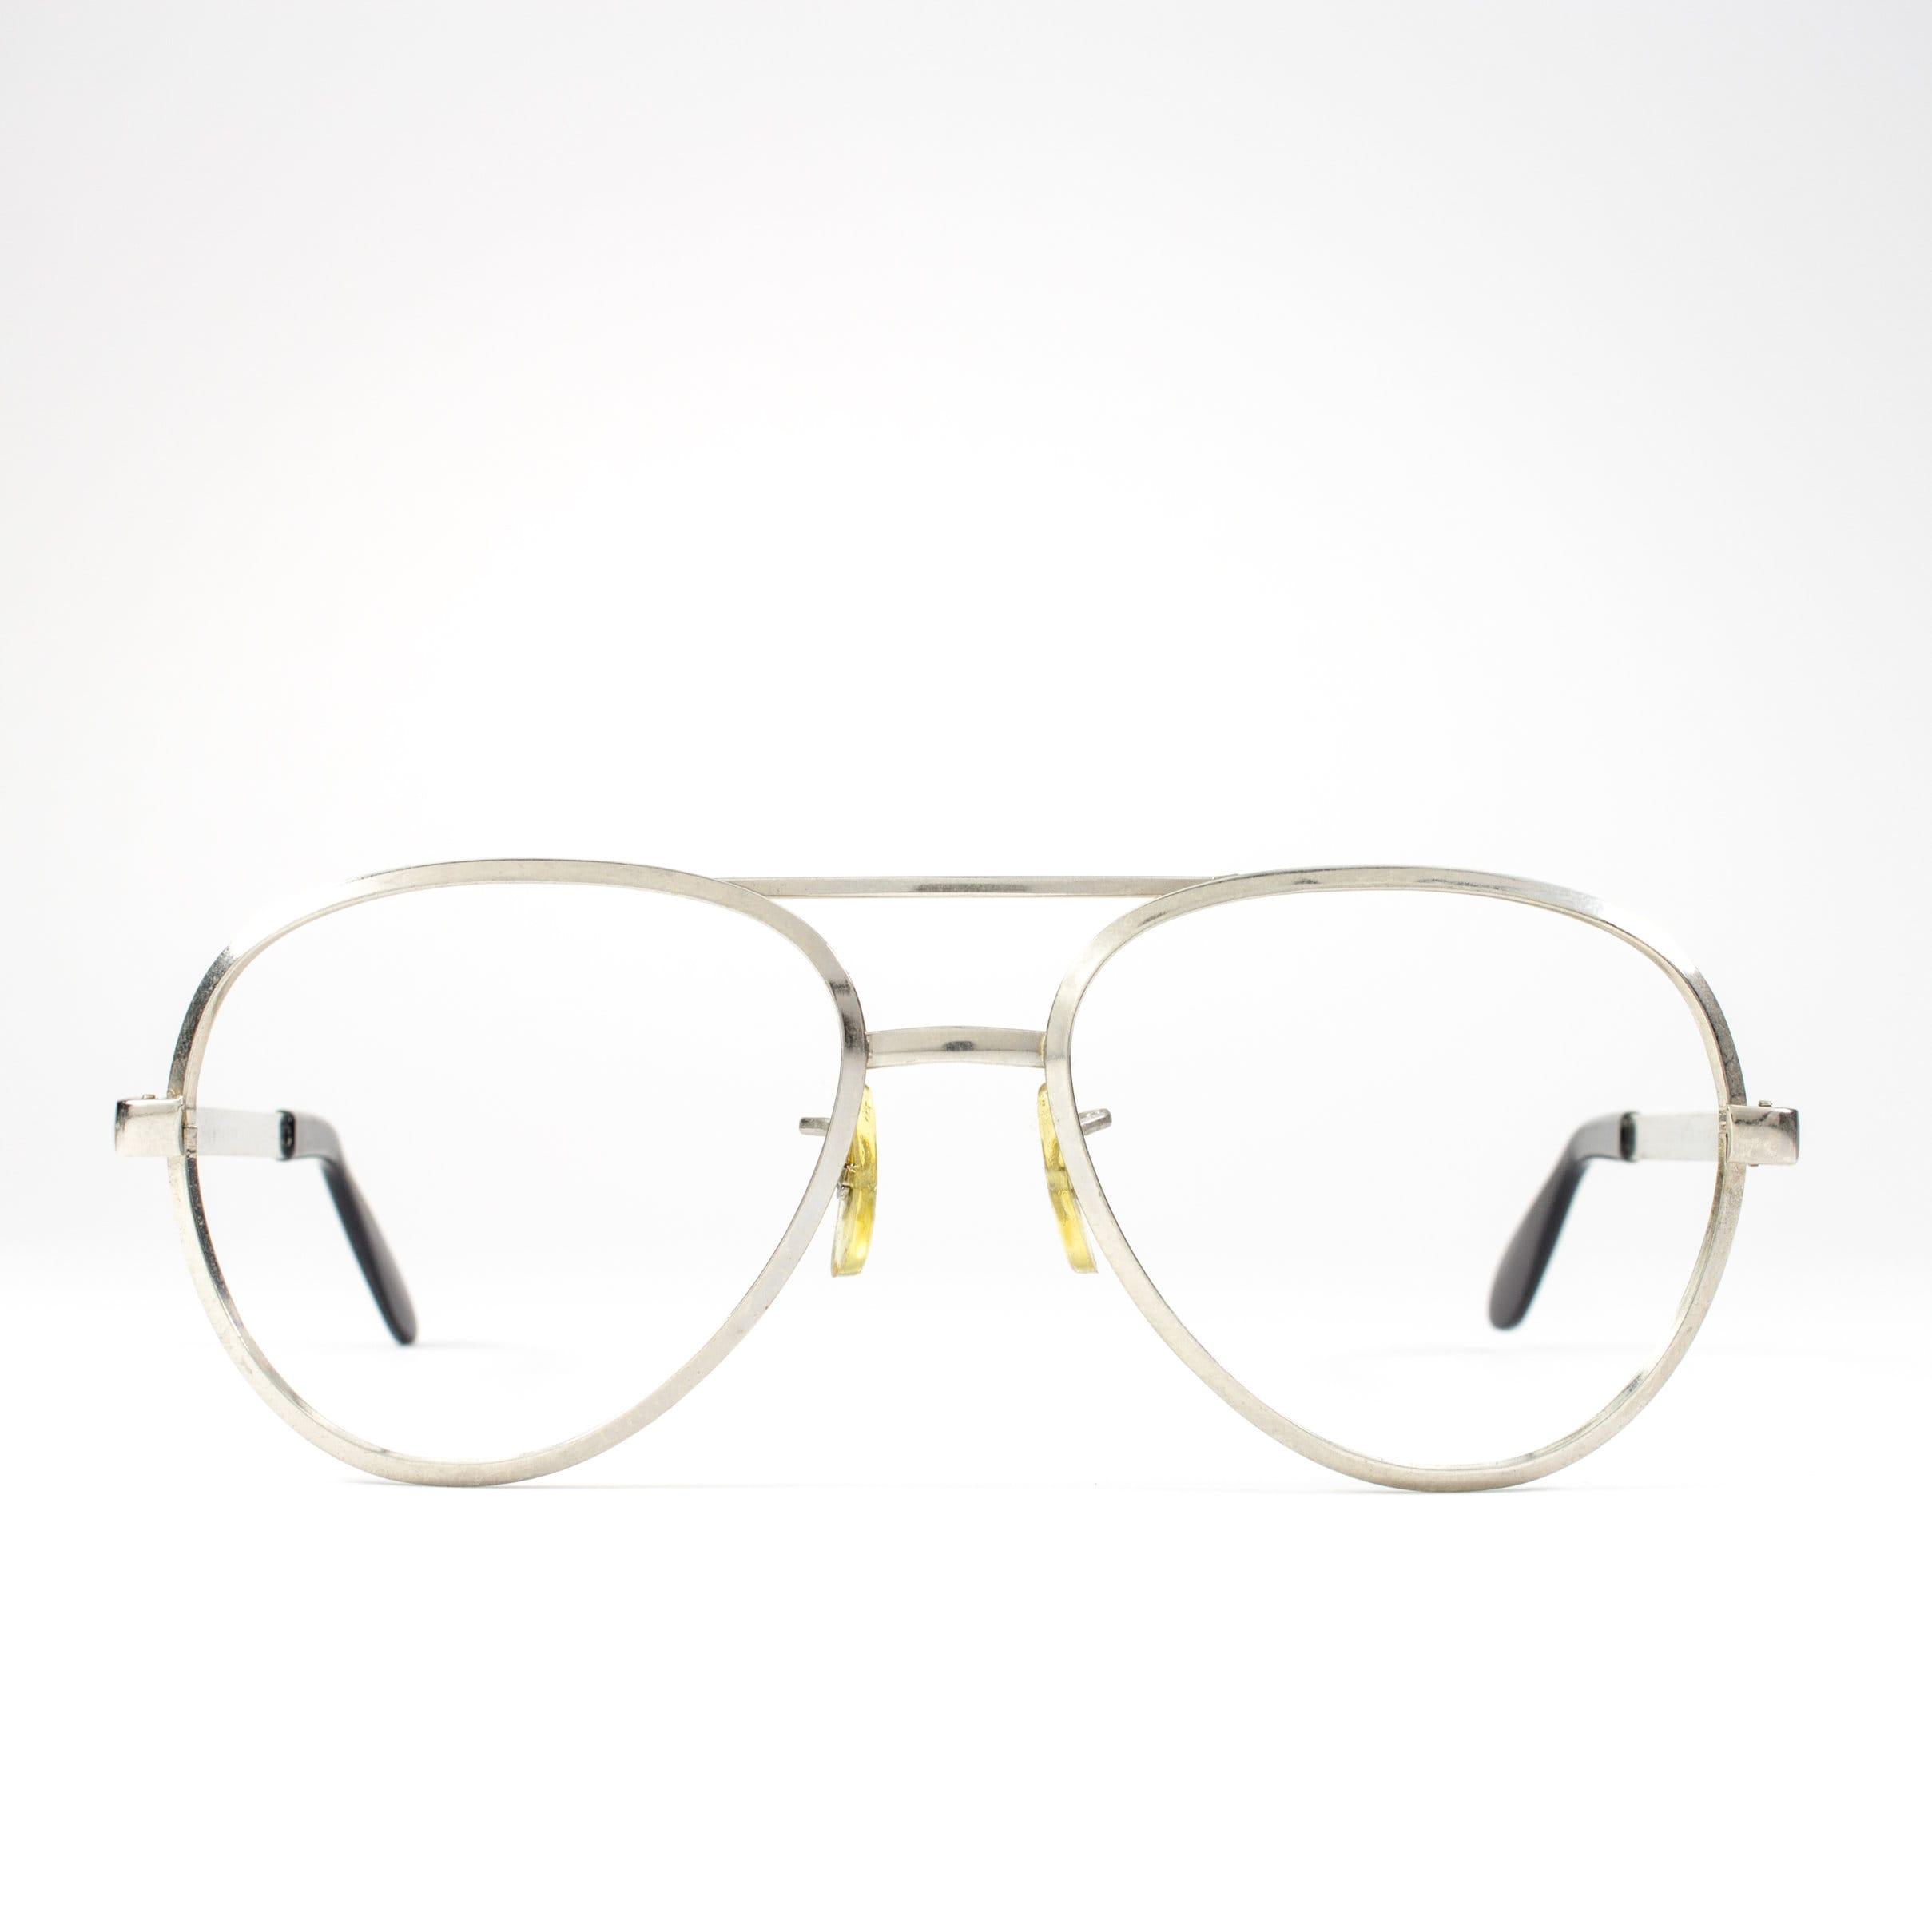 7142a89621c 1970s Vintage Eyeglasses